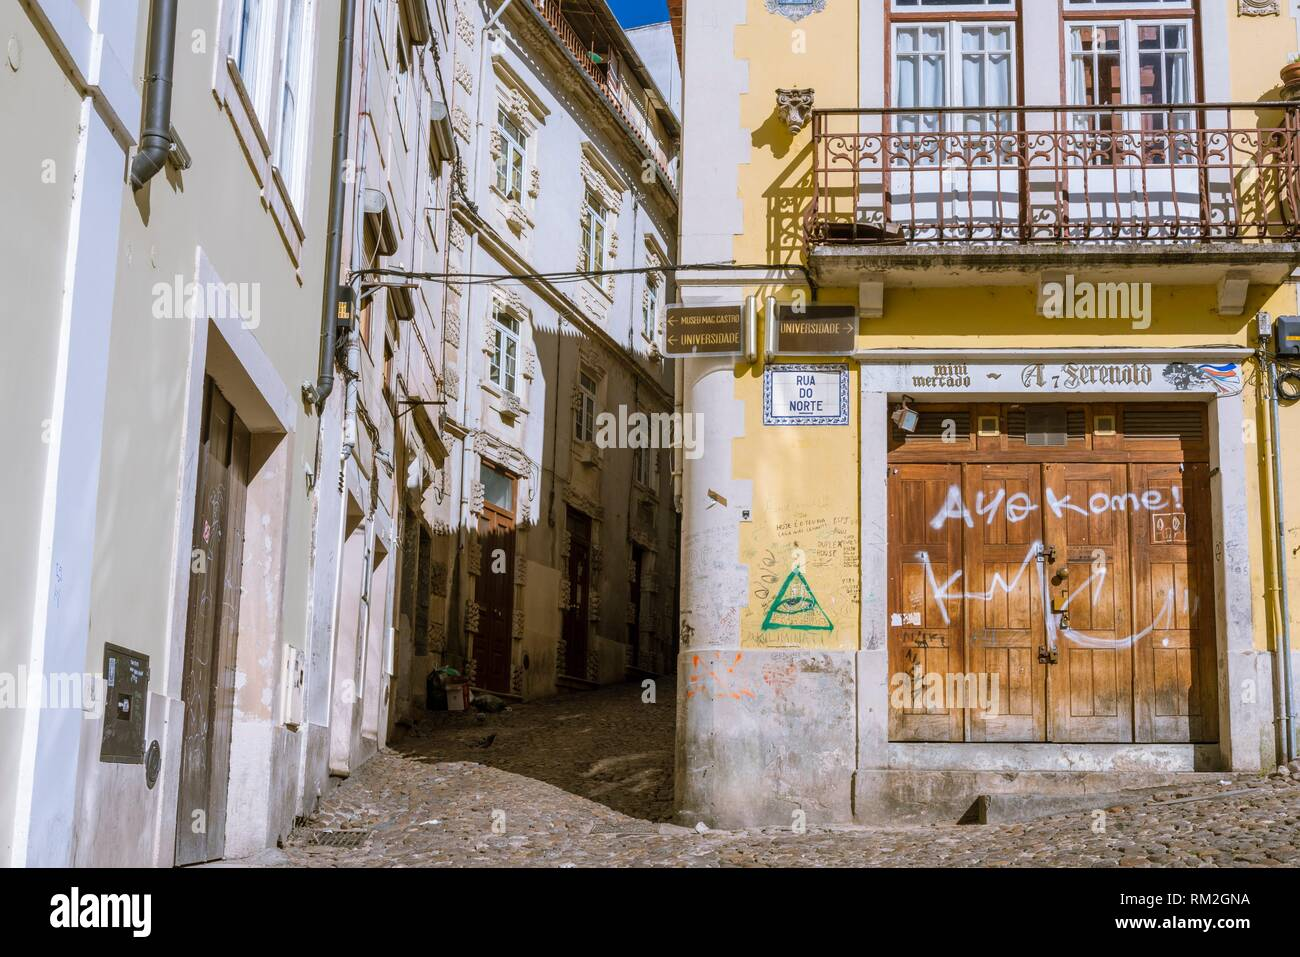 Narrow Sreet near the Old Cathedral, Sé Velha, Coimbra, Baixo Mondego, Centro Region, Portugal, Europe. - Stock Image